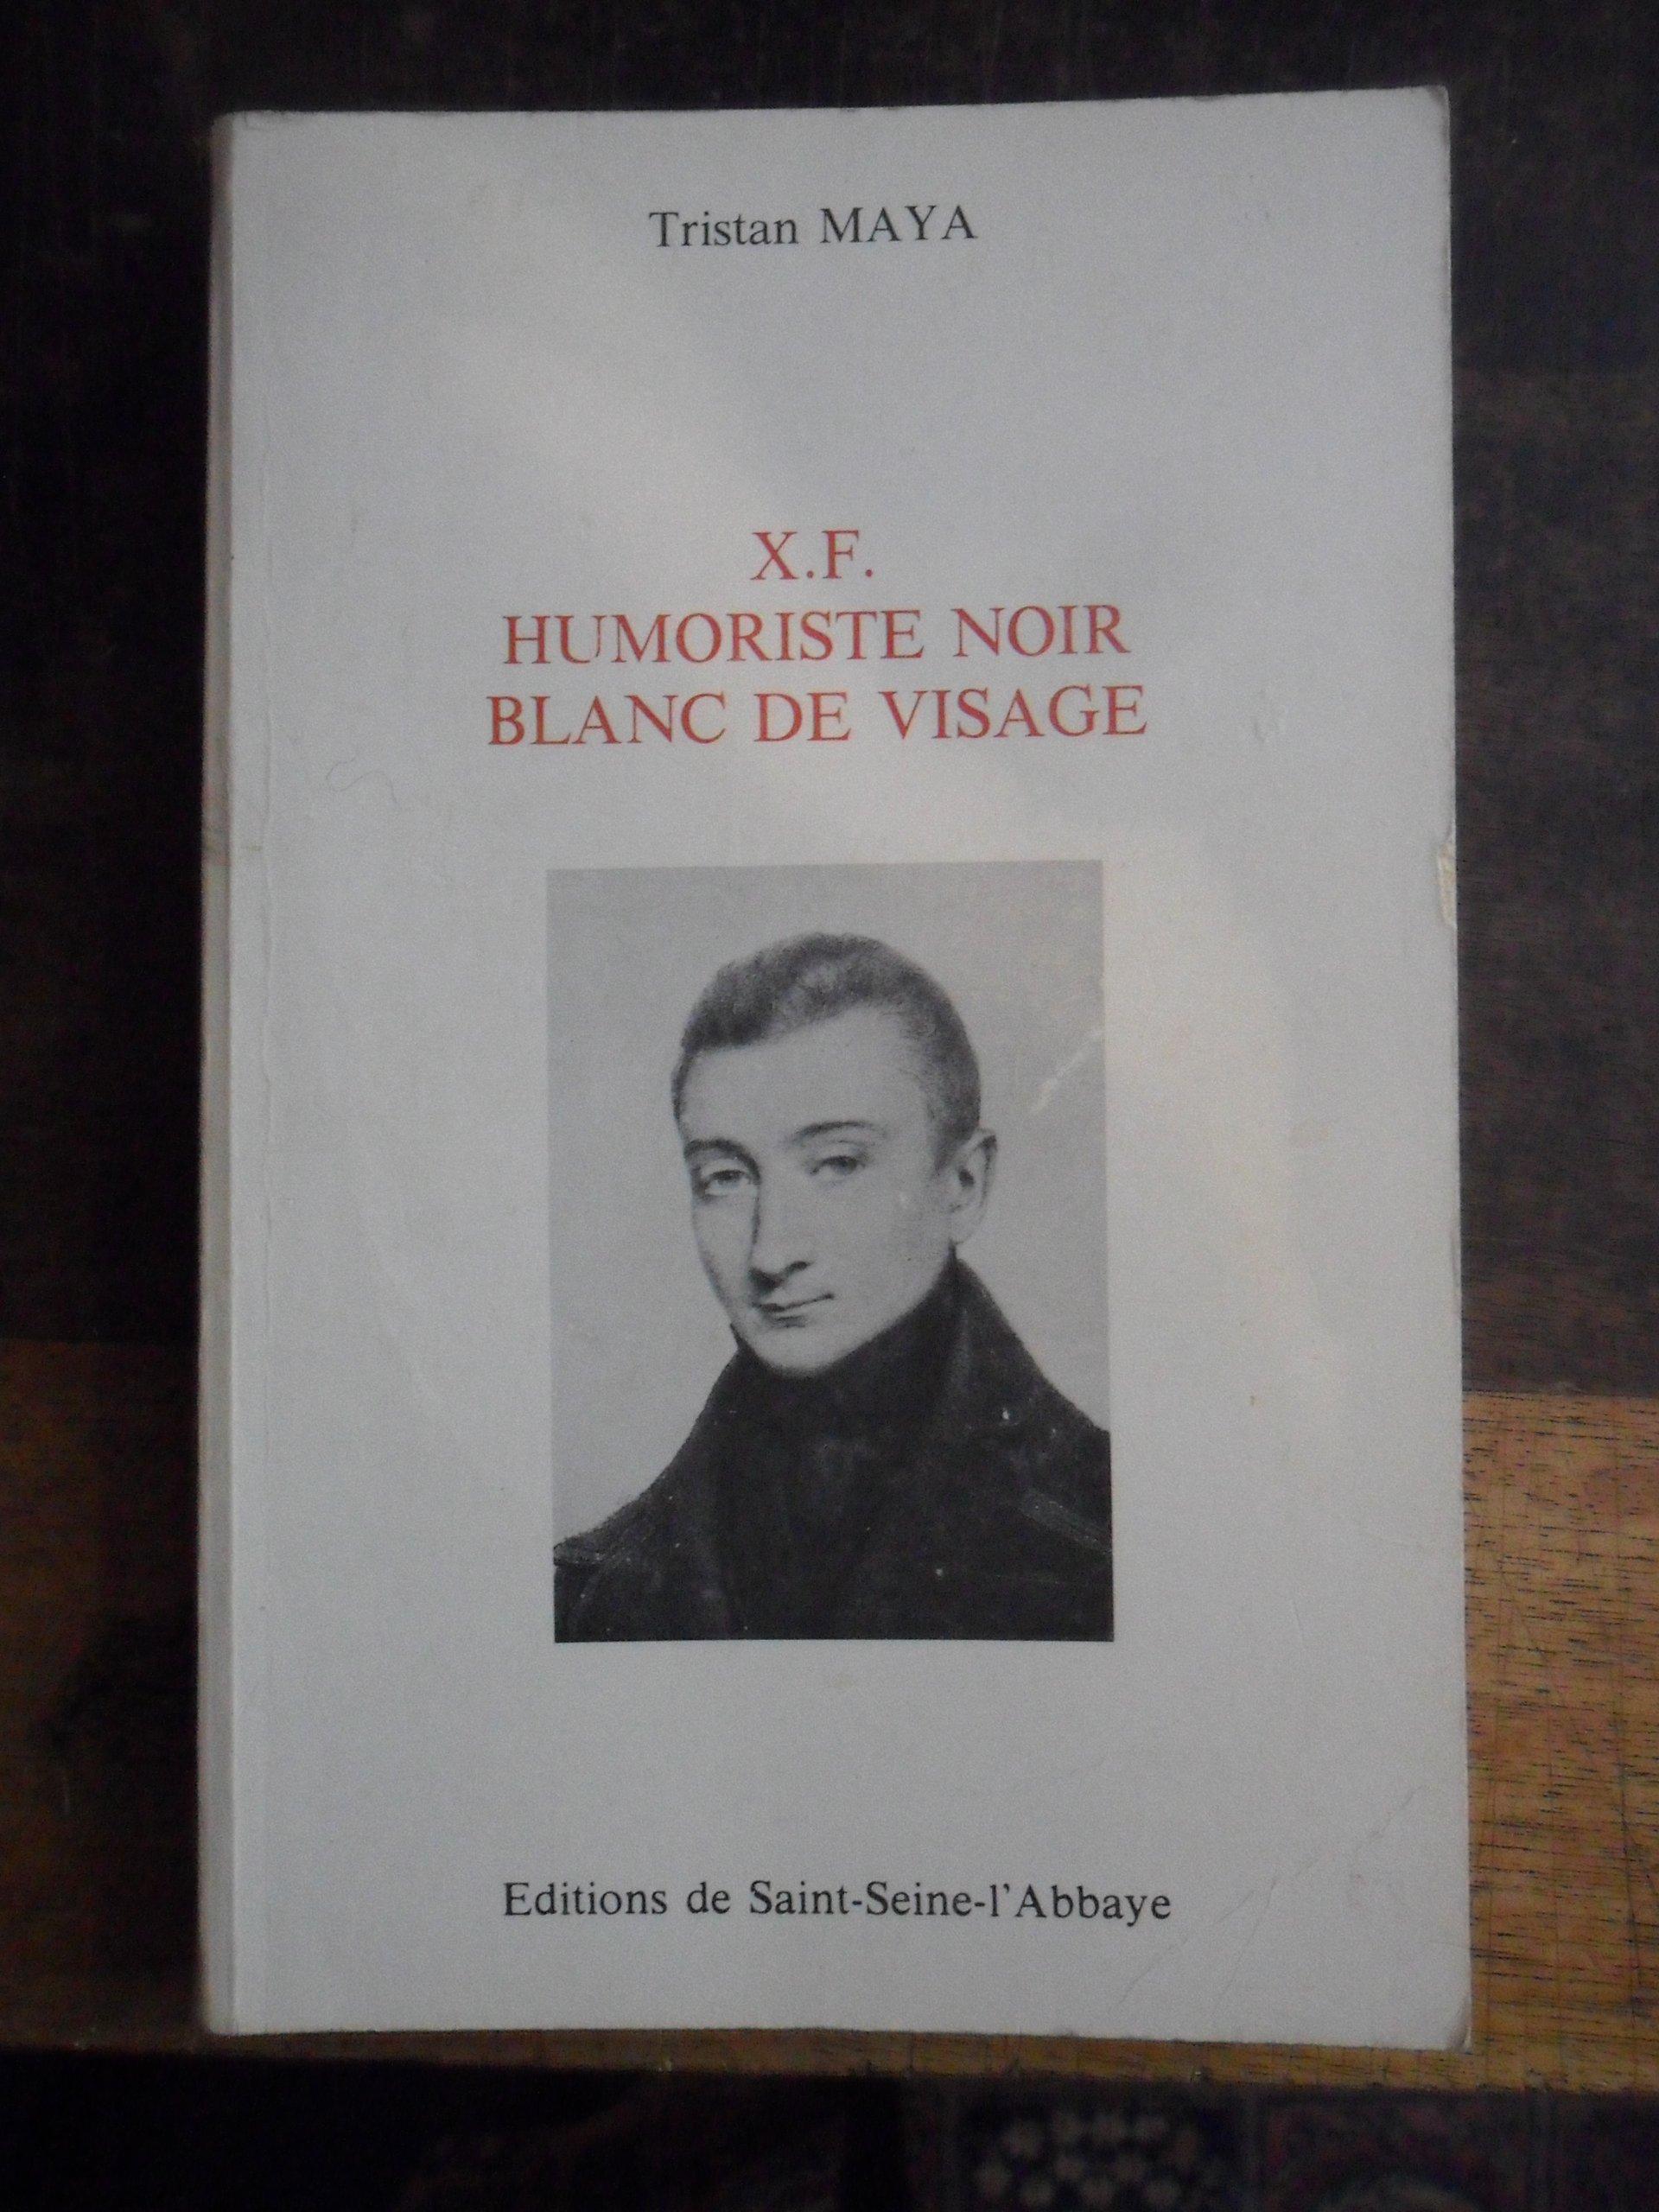 Xf Humoriste Noir Blanc De Visage French Edition